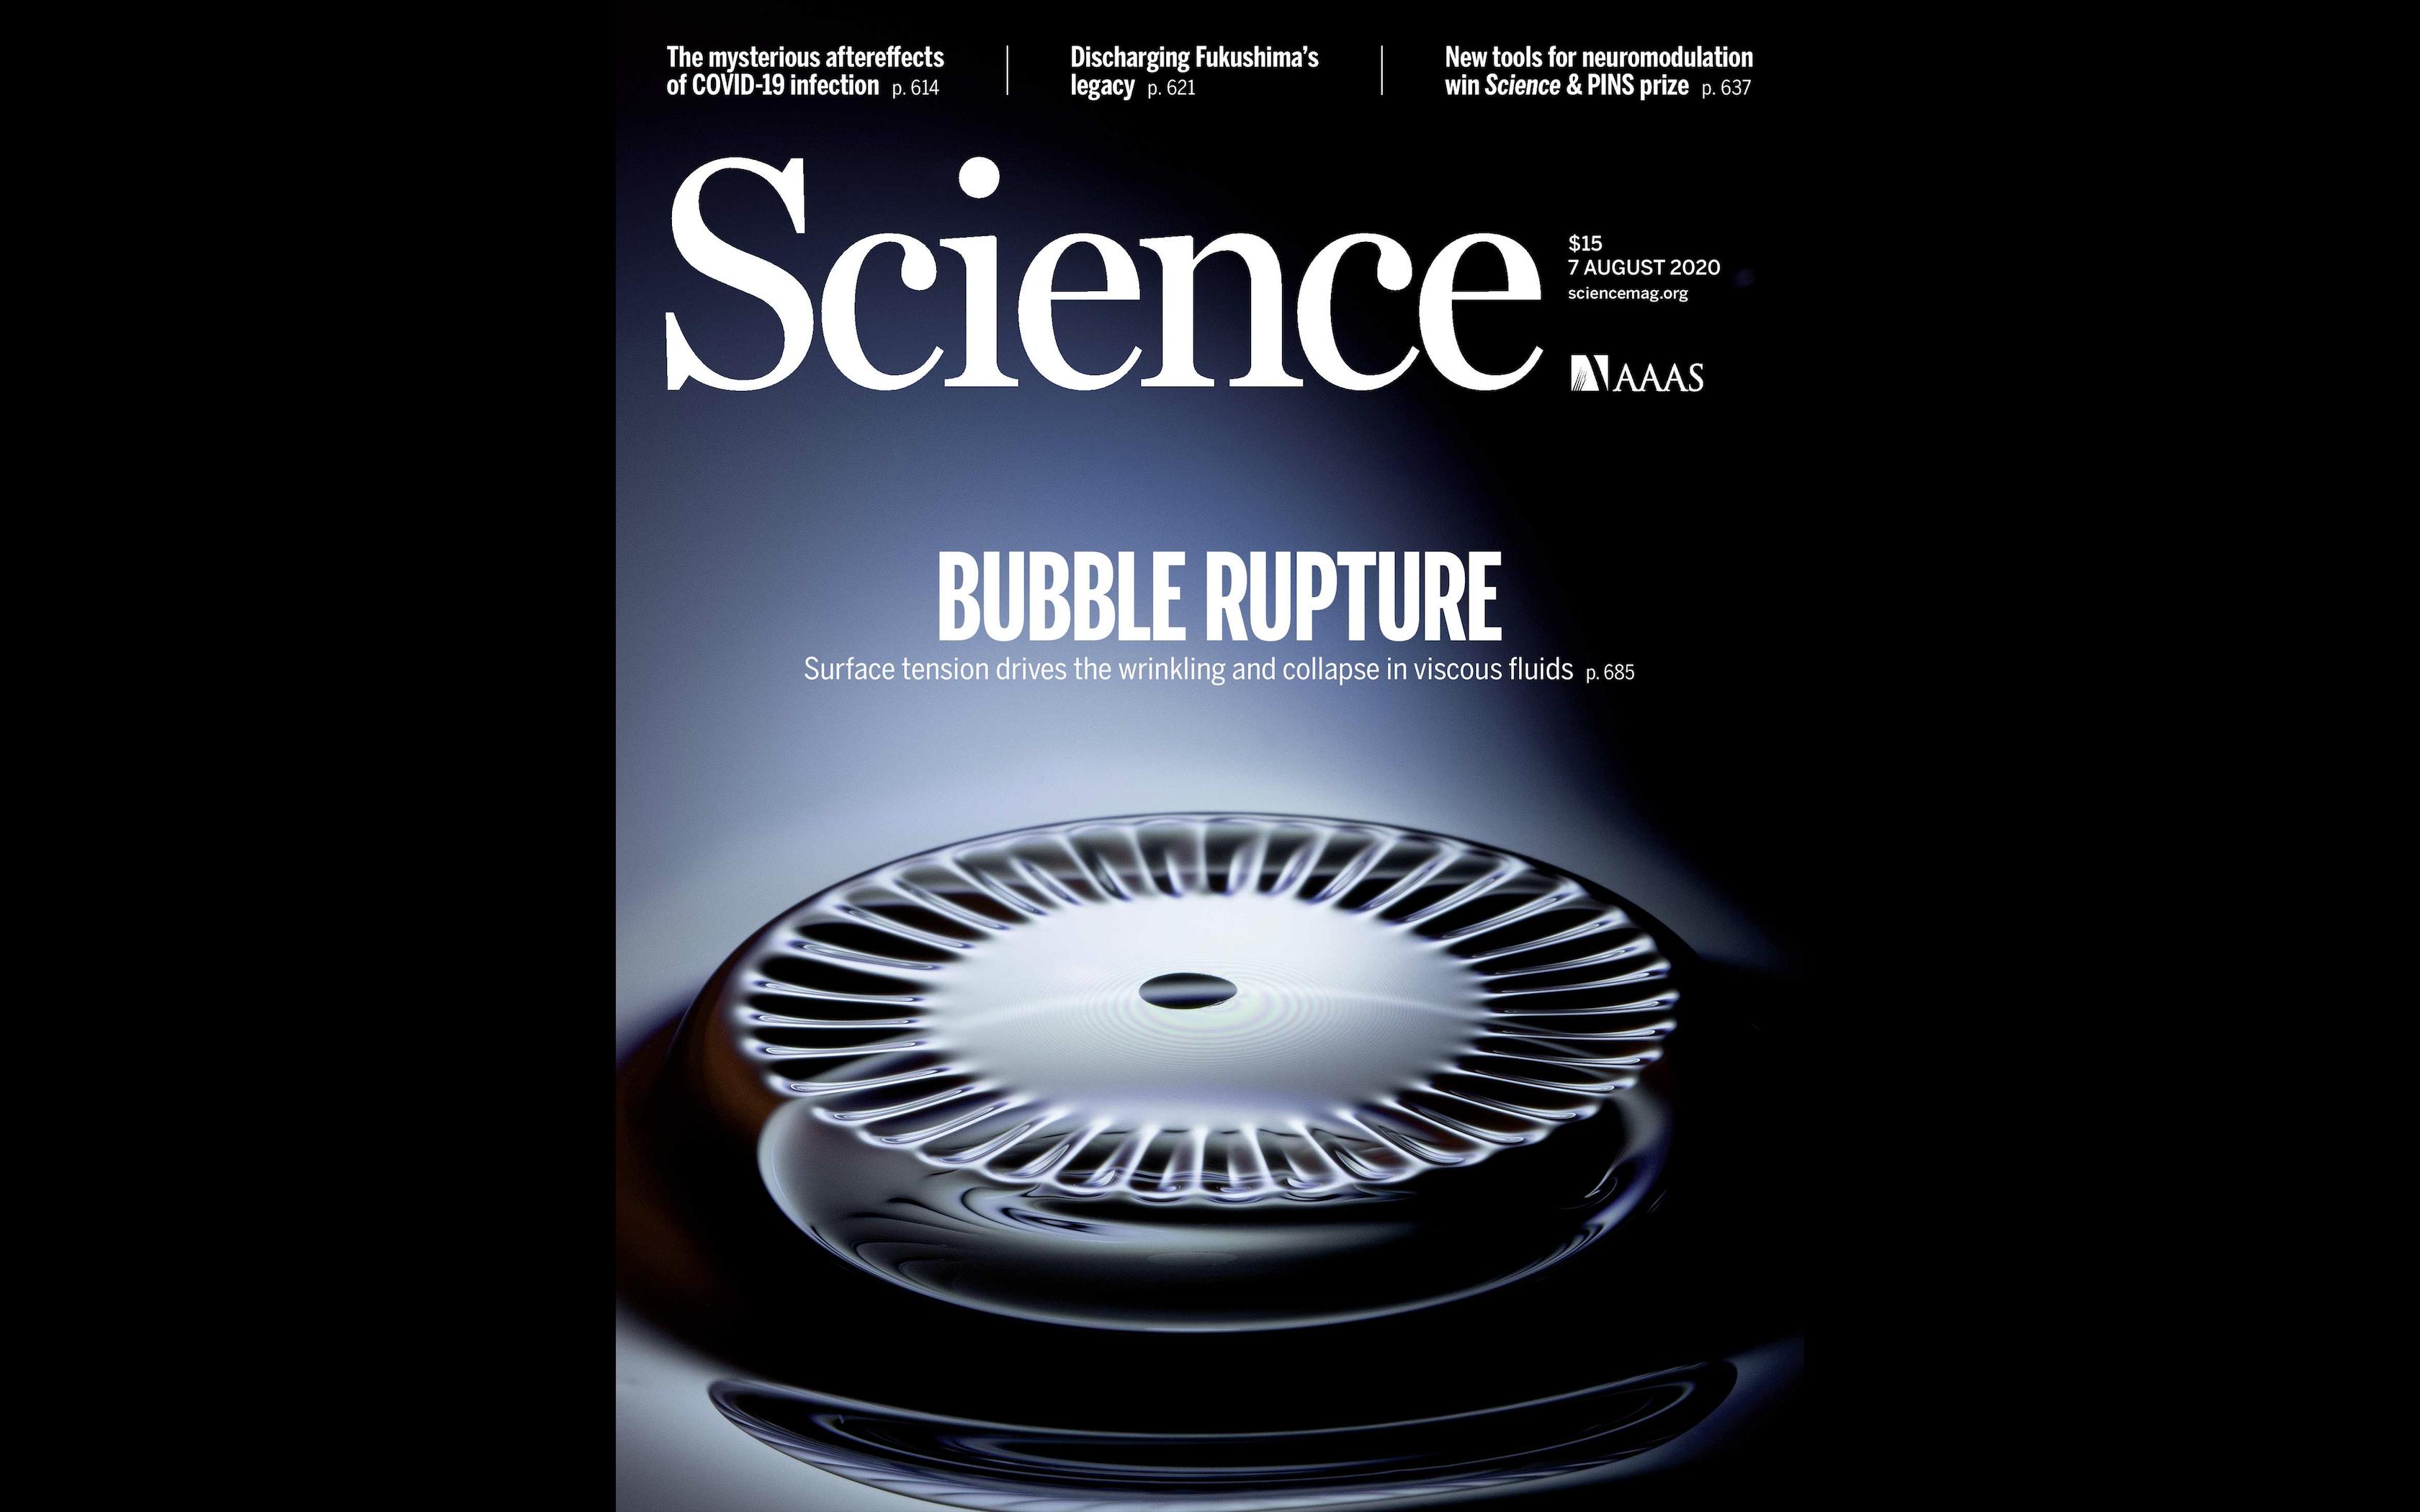 Журнал Science Август 2020: главные материалы